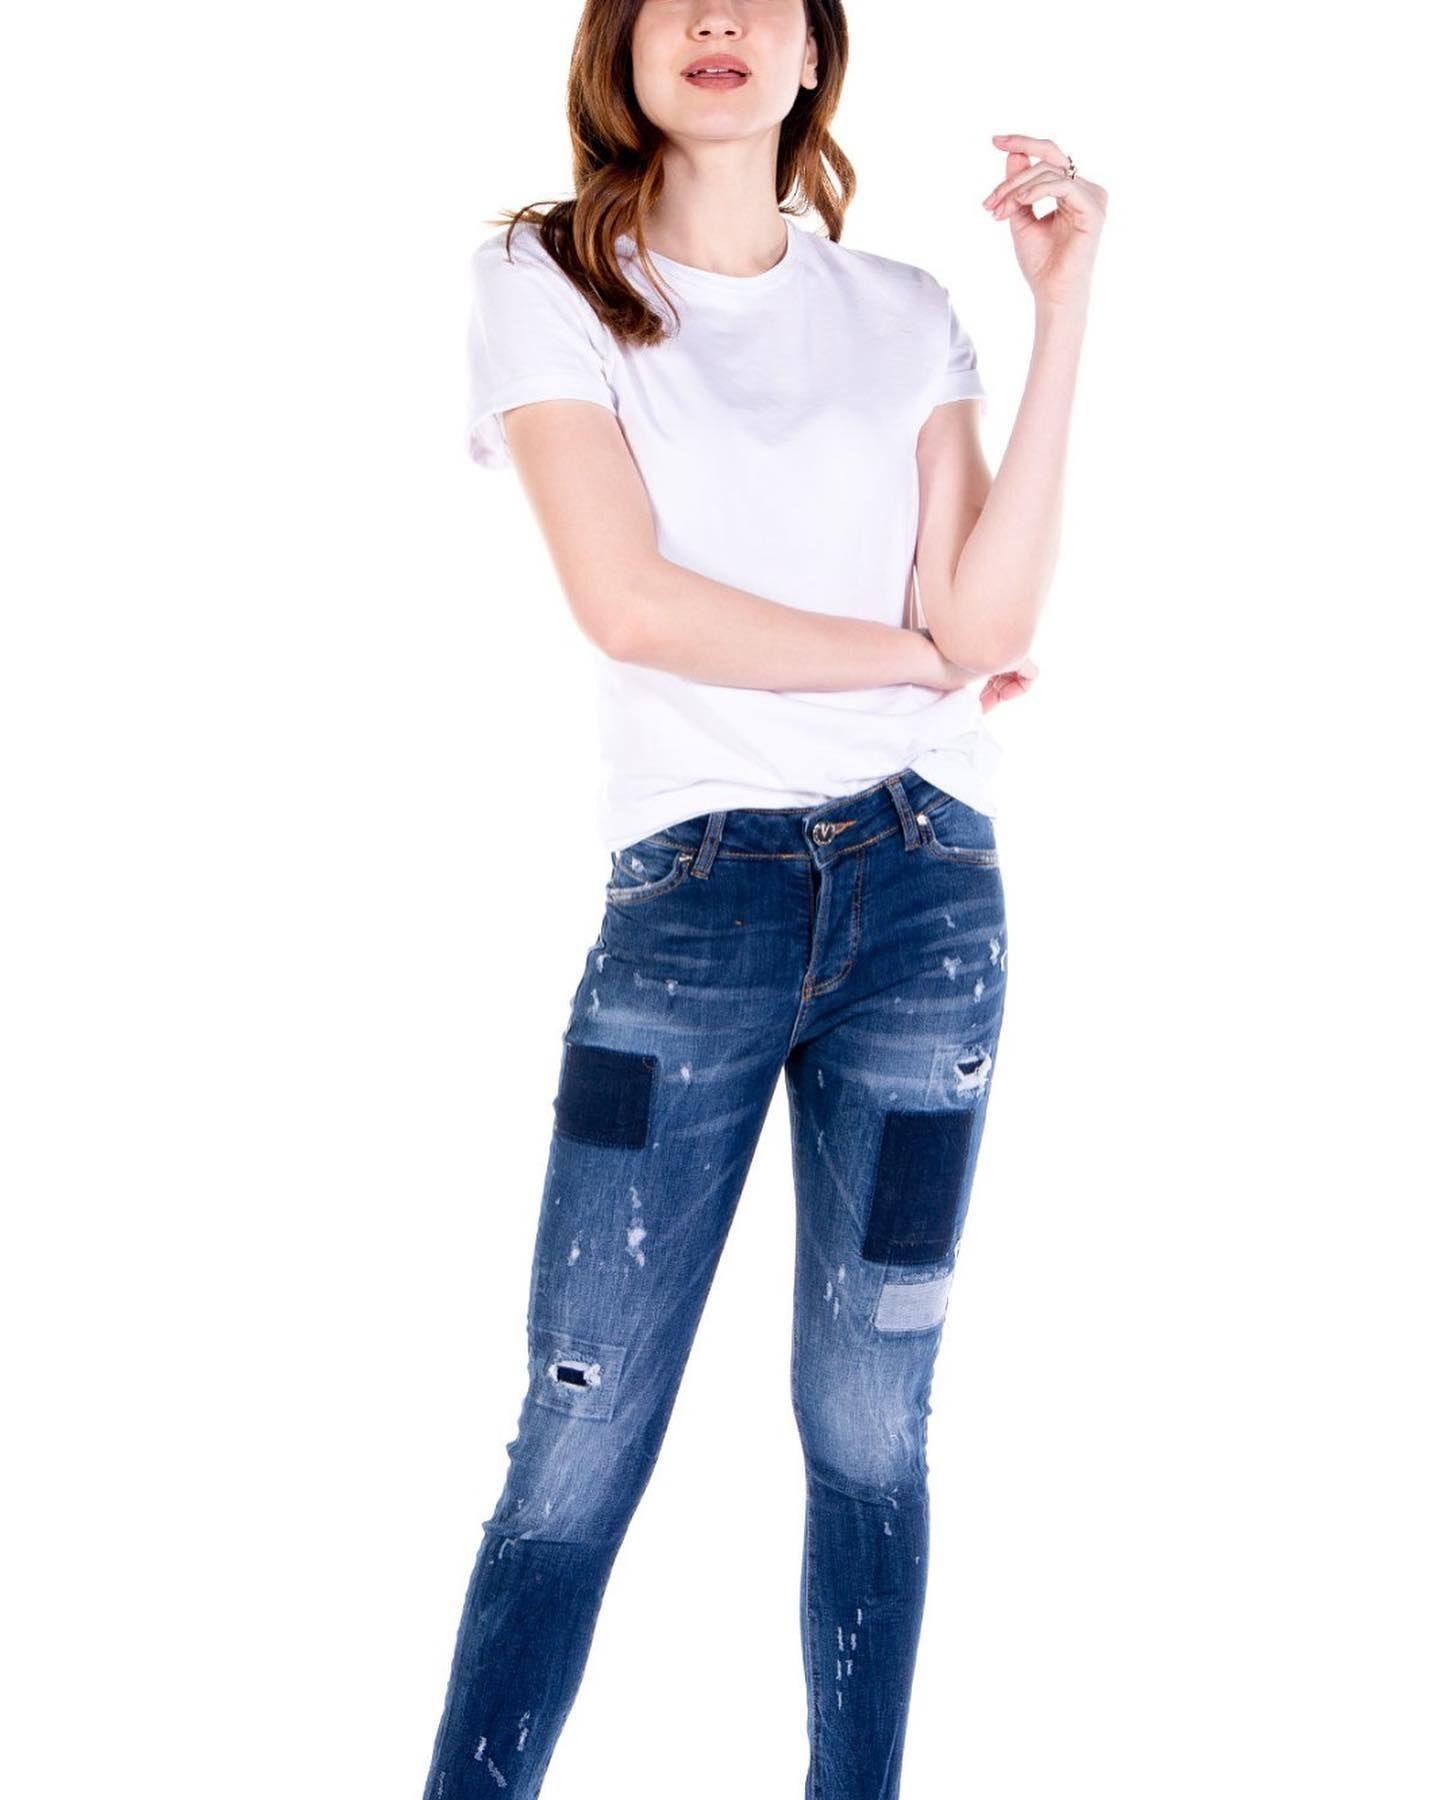 Yuksek Bel Dar Paca Sokuk Detay Kot Pantolon Urun Kodu Vkng71801 Urun Fiyati 129 95 Vikingjeans Vikingjeanswoman Trendyol 2020 Moda Shopping Trendler